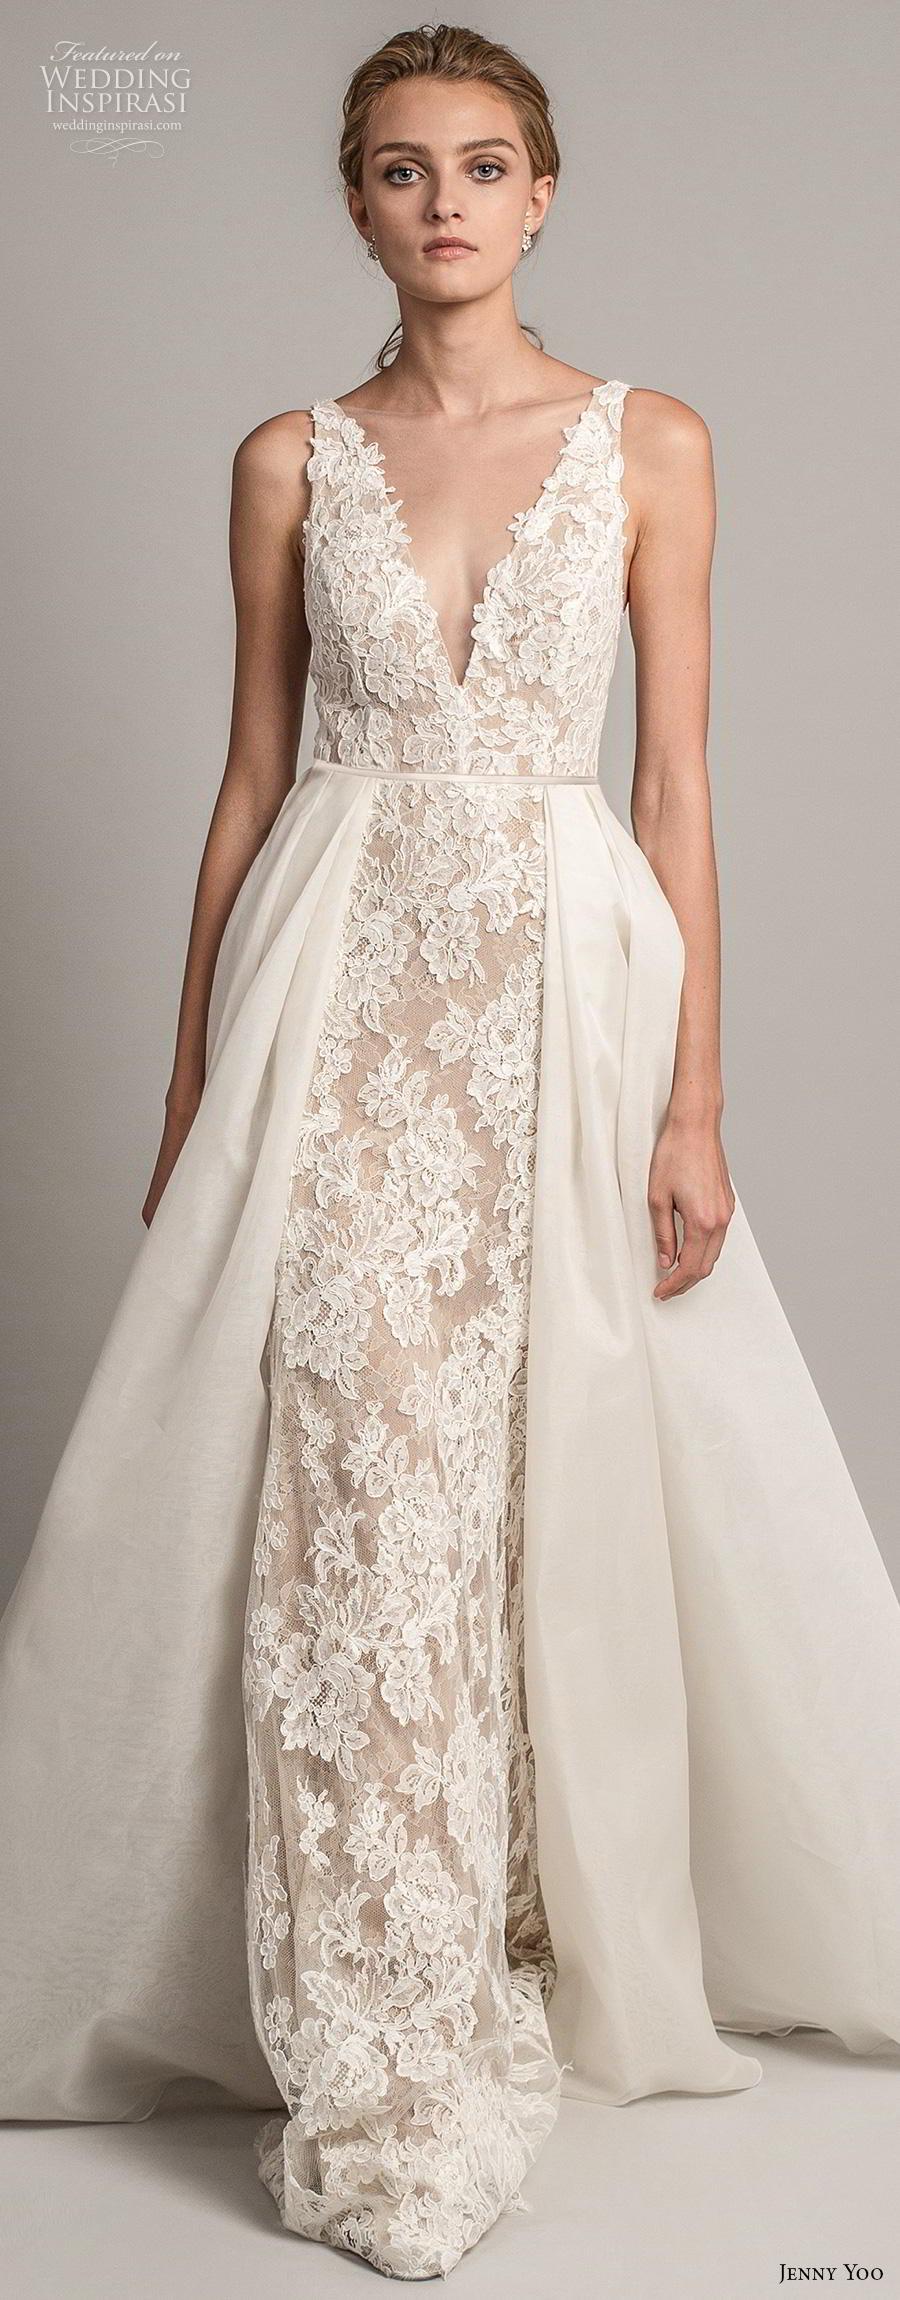 jenny yoo spring 2019 bridal sleeveless with strap deep v neck full embellishment elegant sheath wedding dress a  line overskirt backless v back chapel train (8) lv